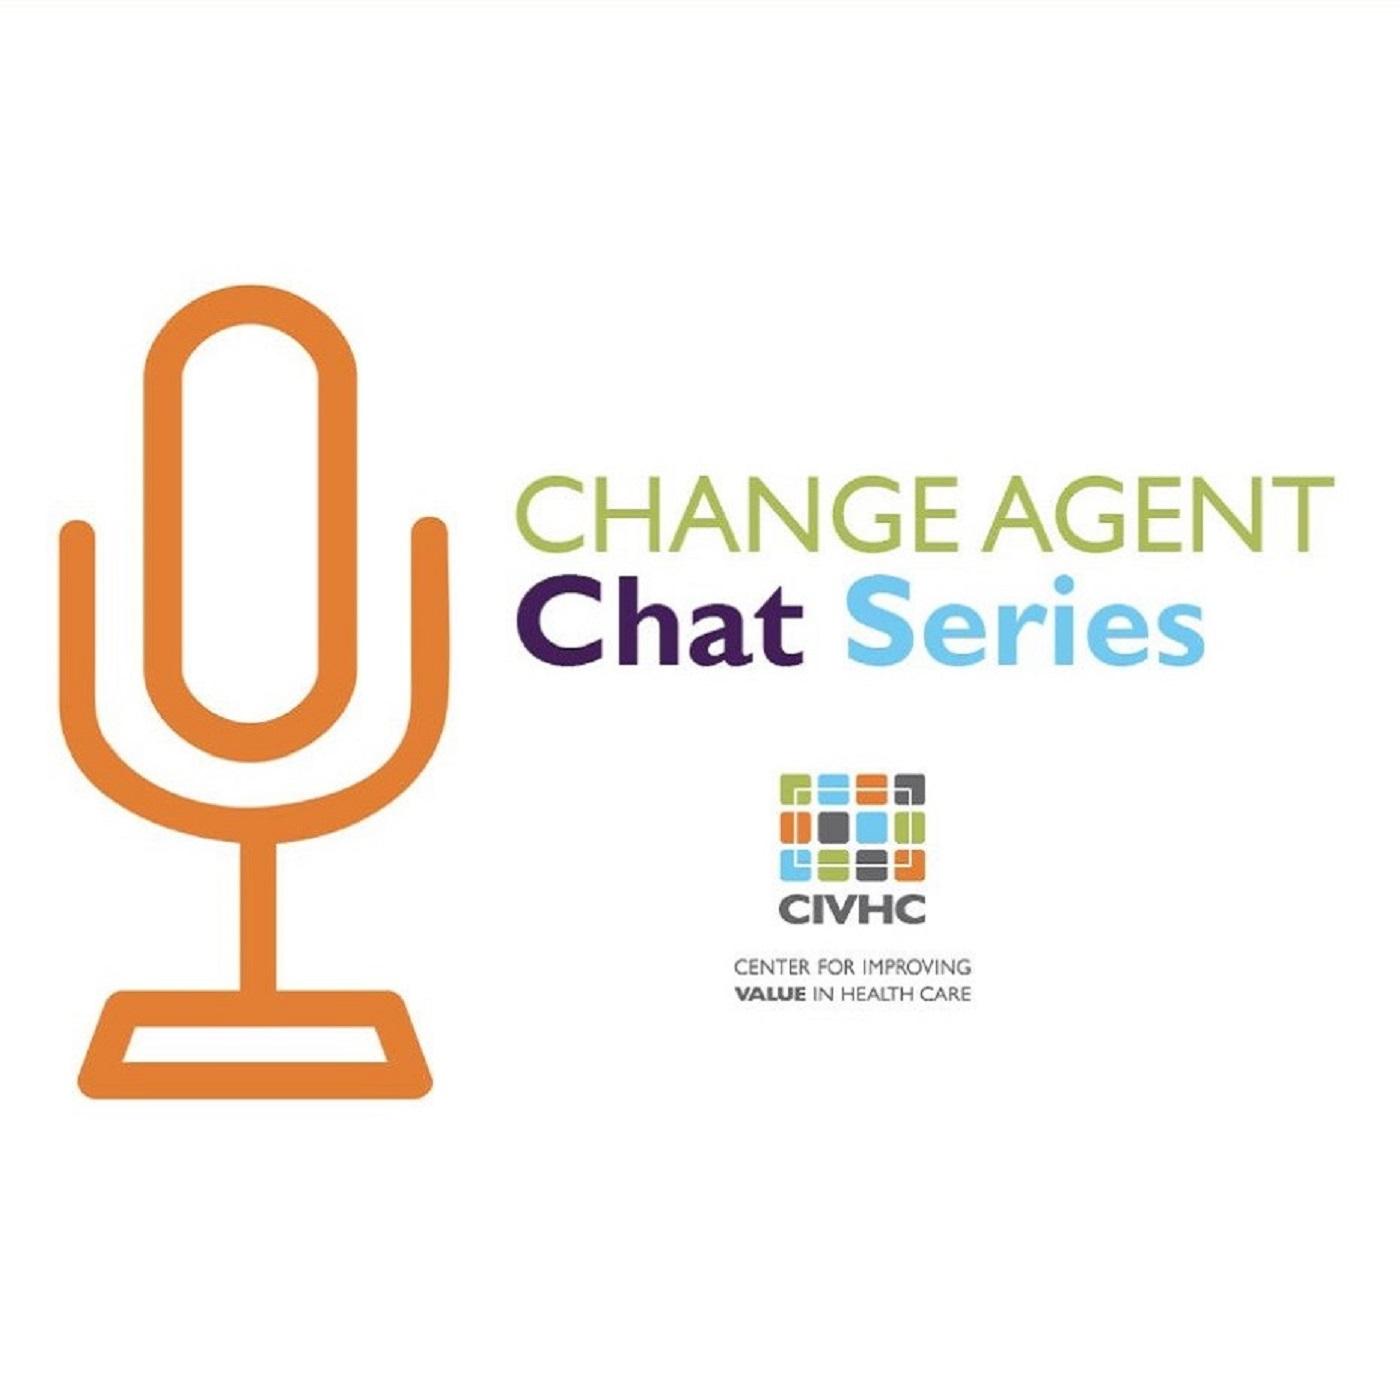 CIVHC Change Agent Chat